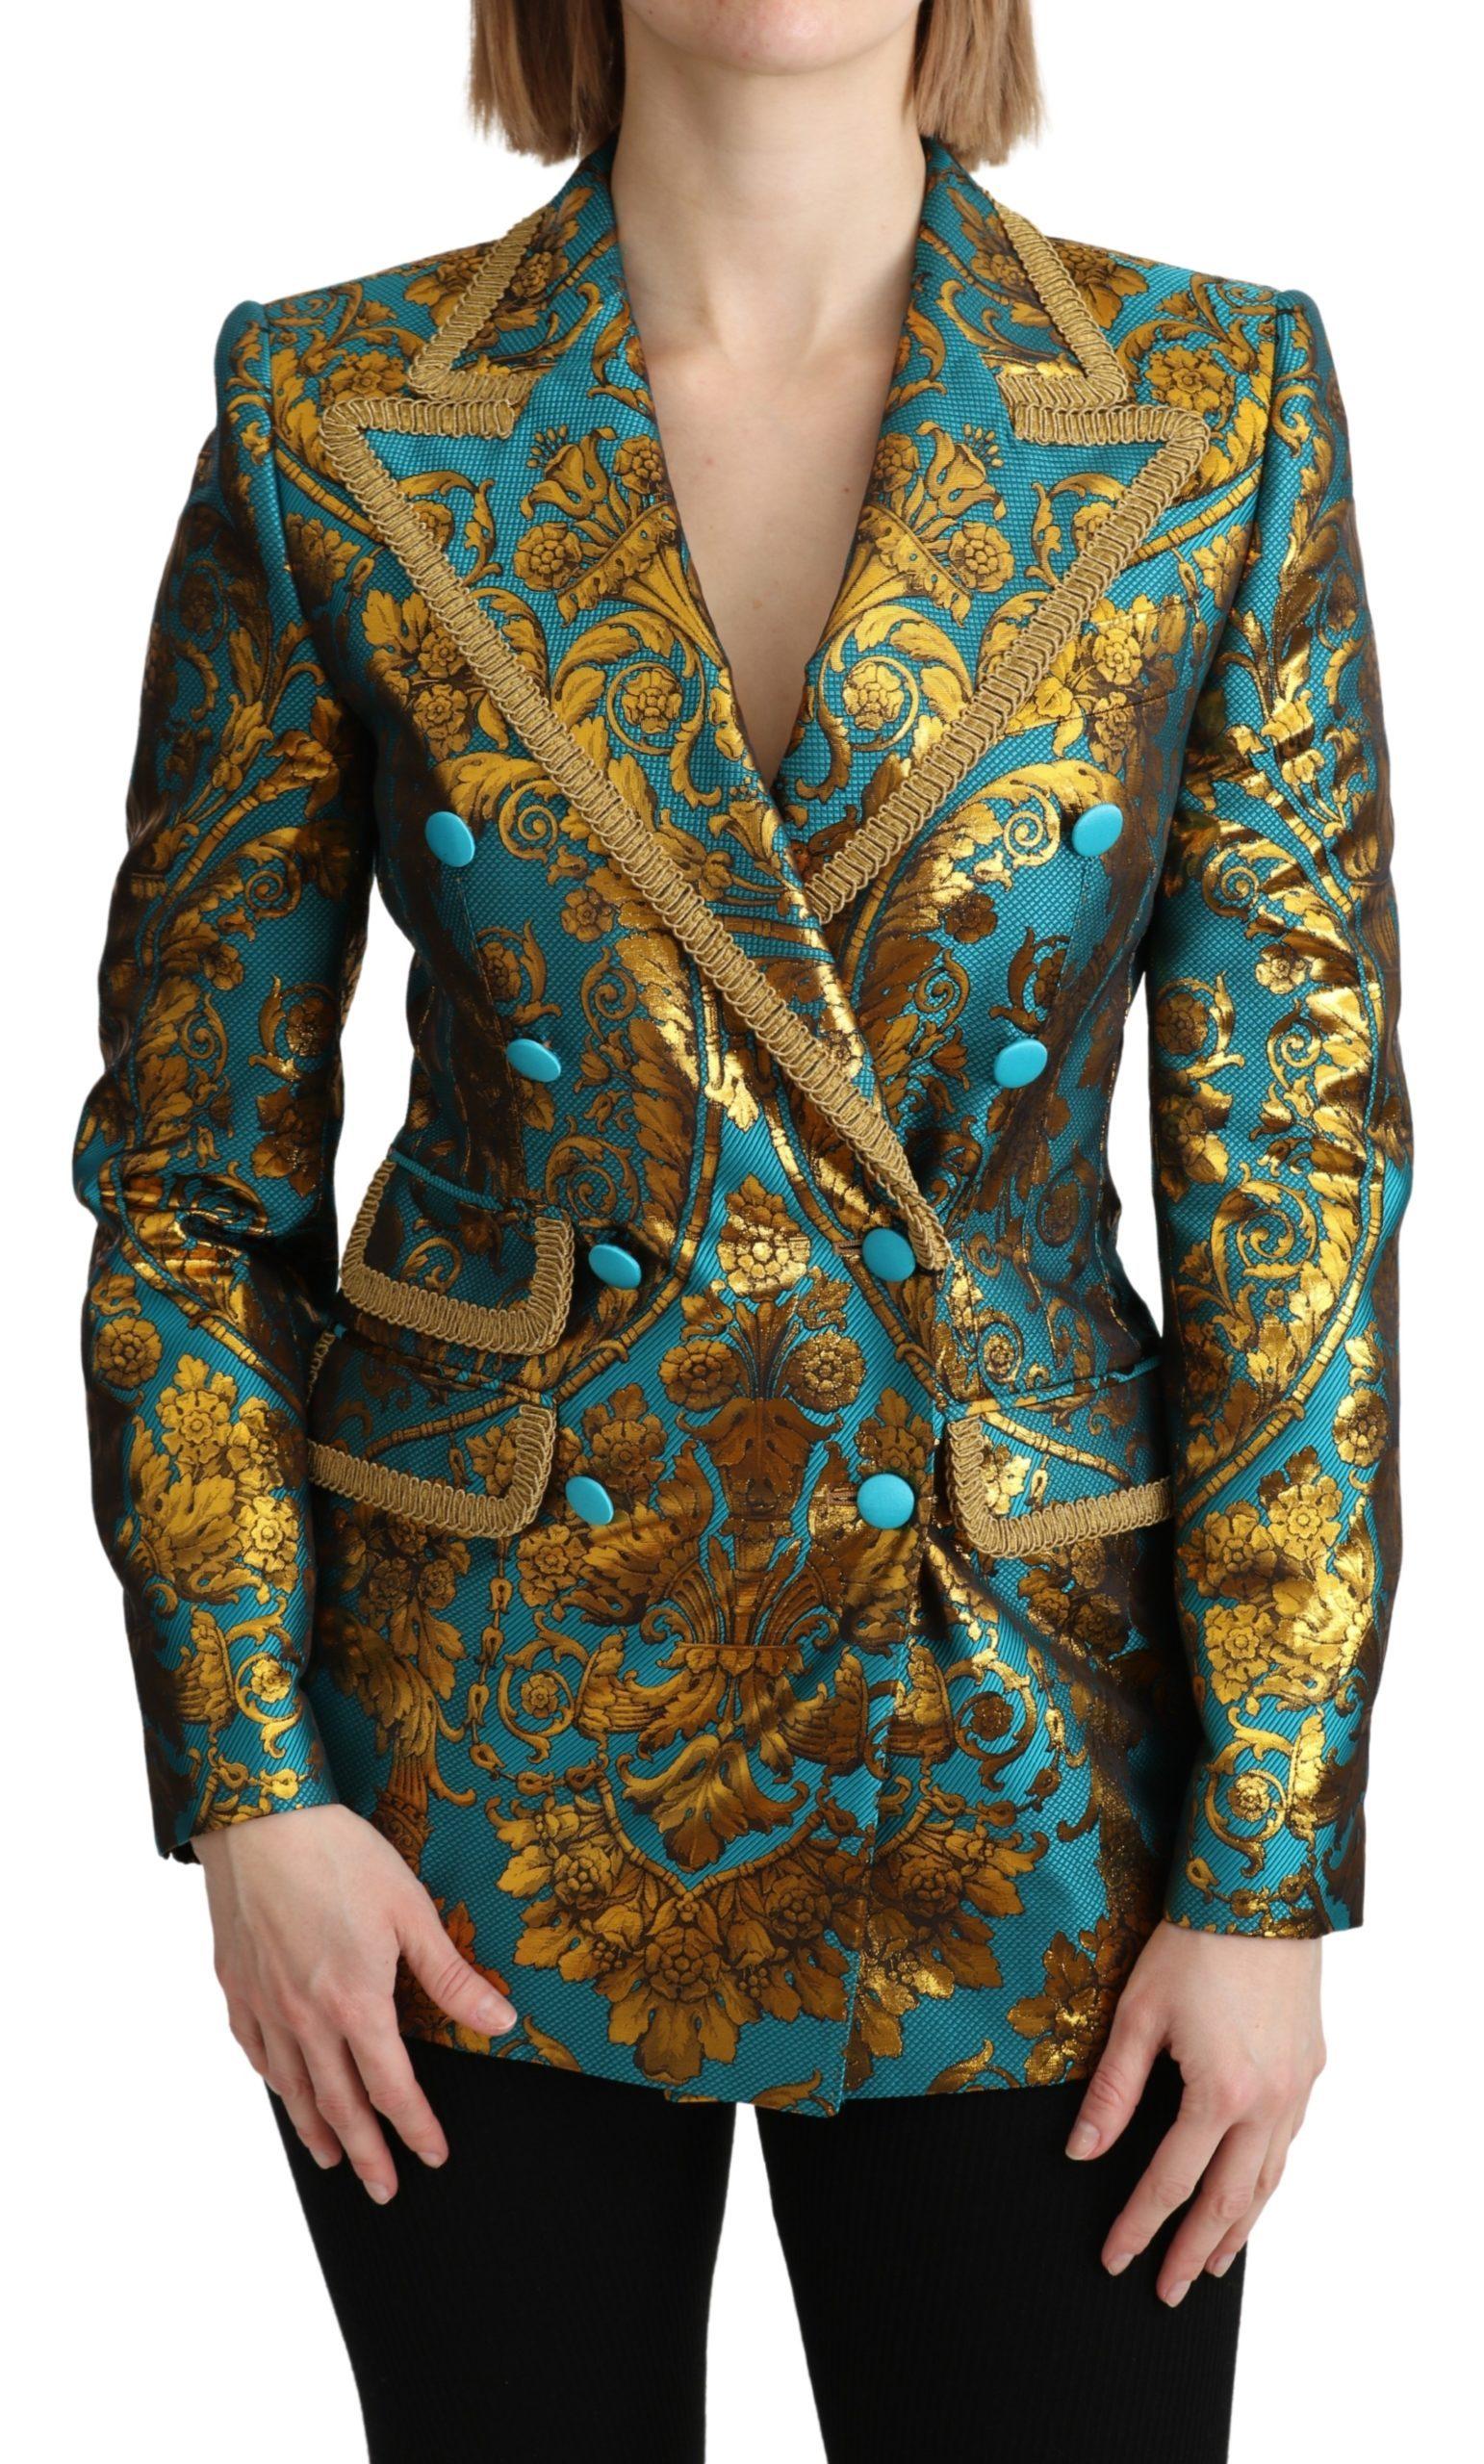 Dolce & Gabbana Women's Jacquard Blazer Gold JKT2665 - IT36 | XS